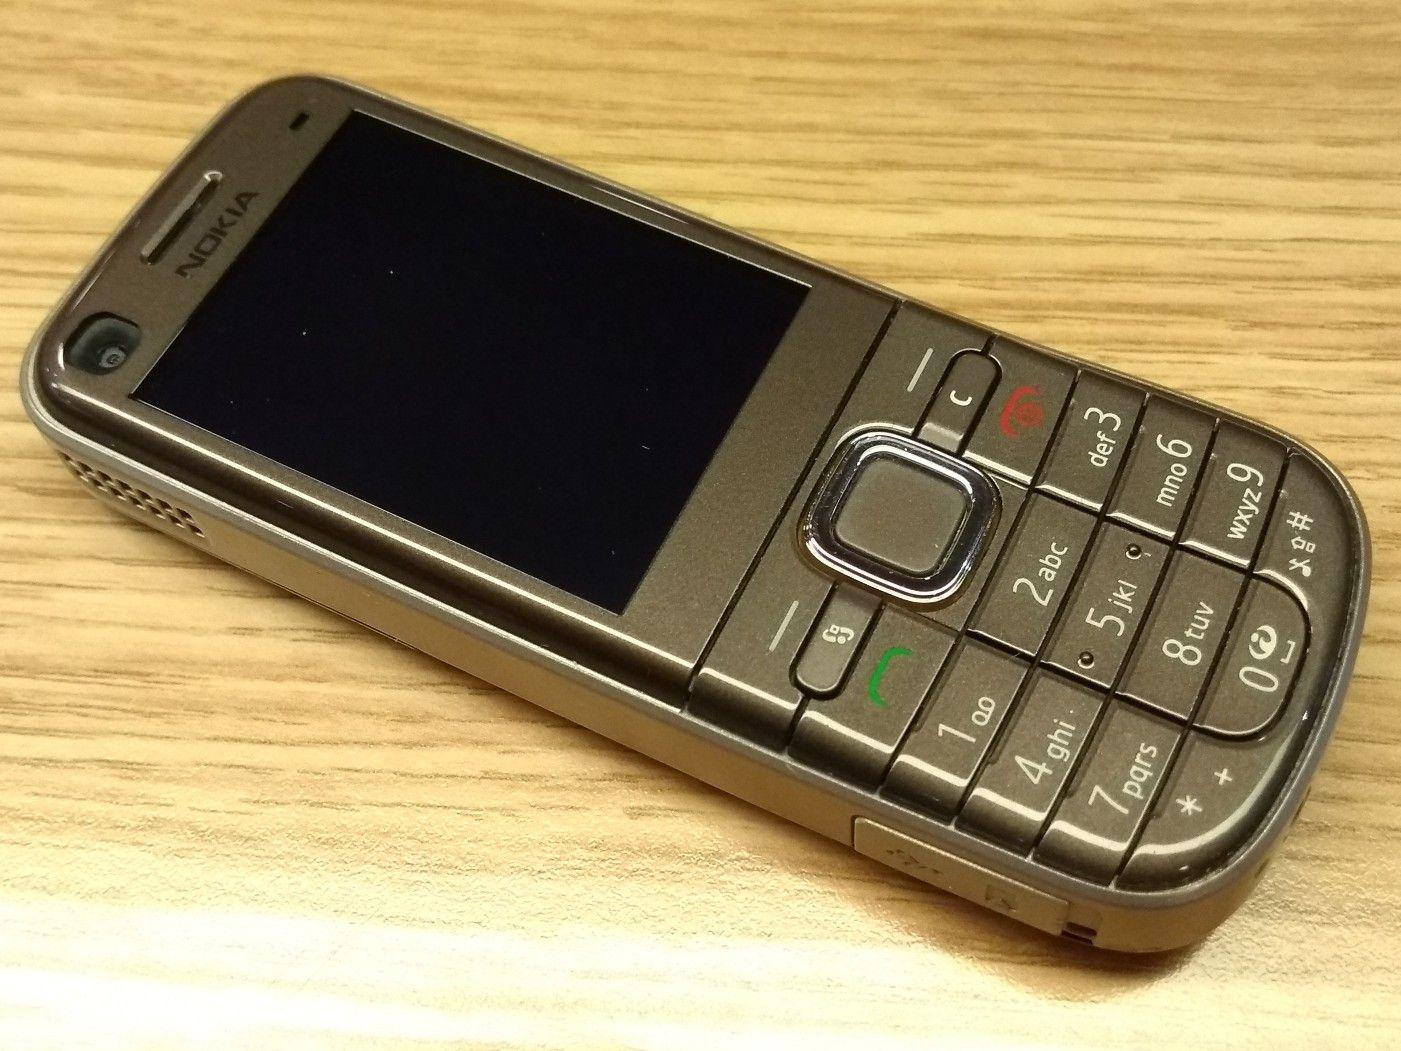 Pin by أحمد محمد on موبيلات تحفه in 2020 Nokia